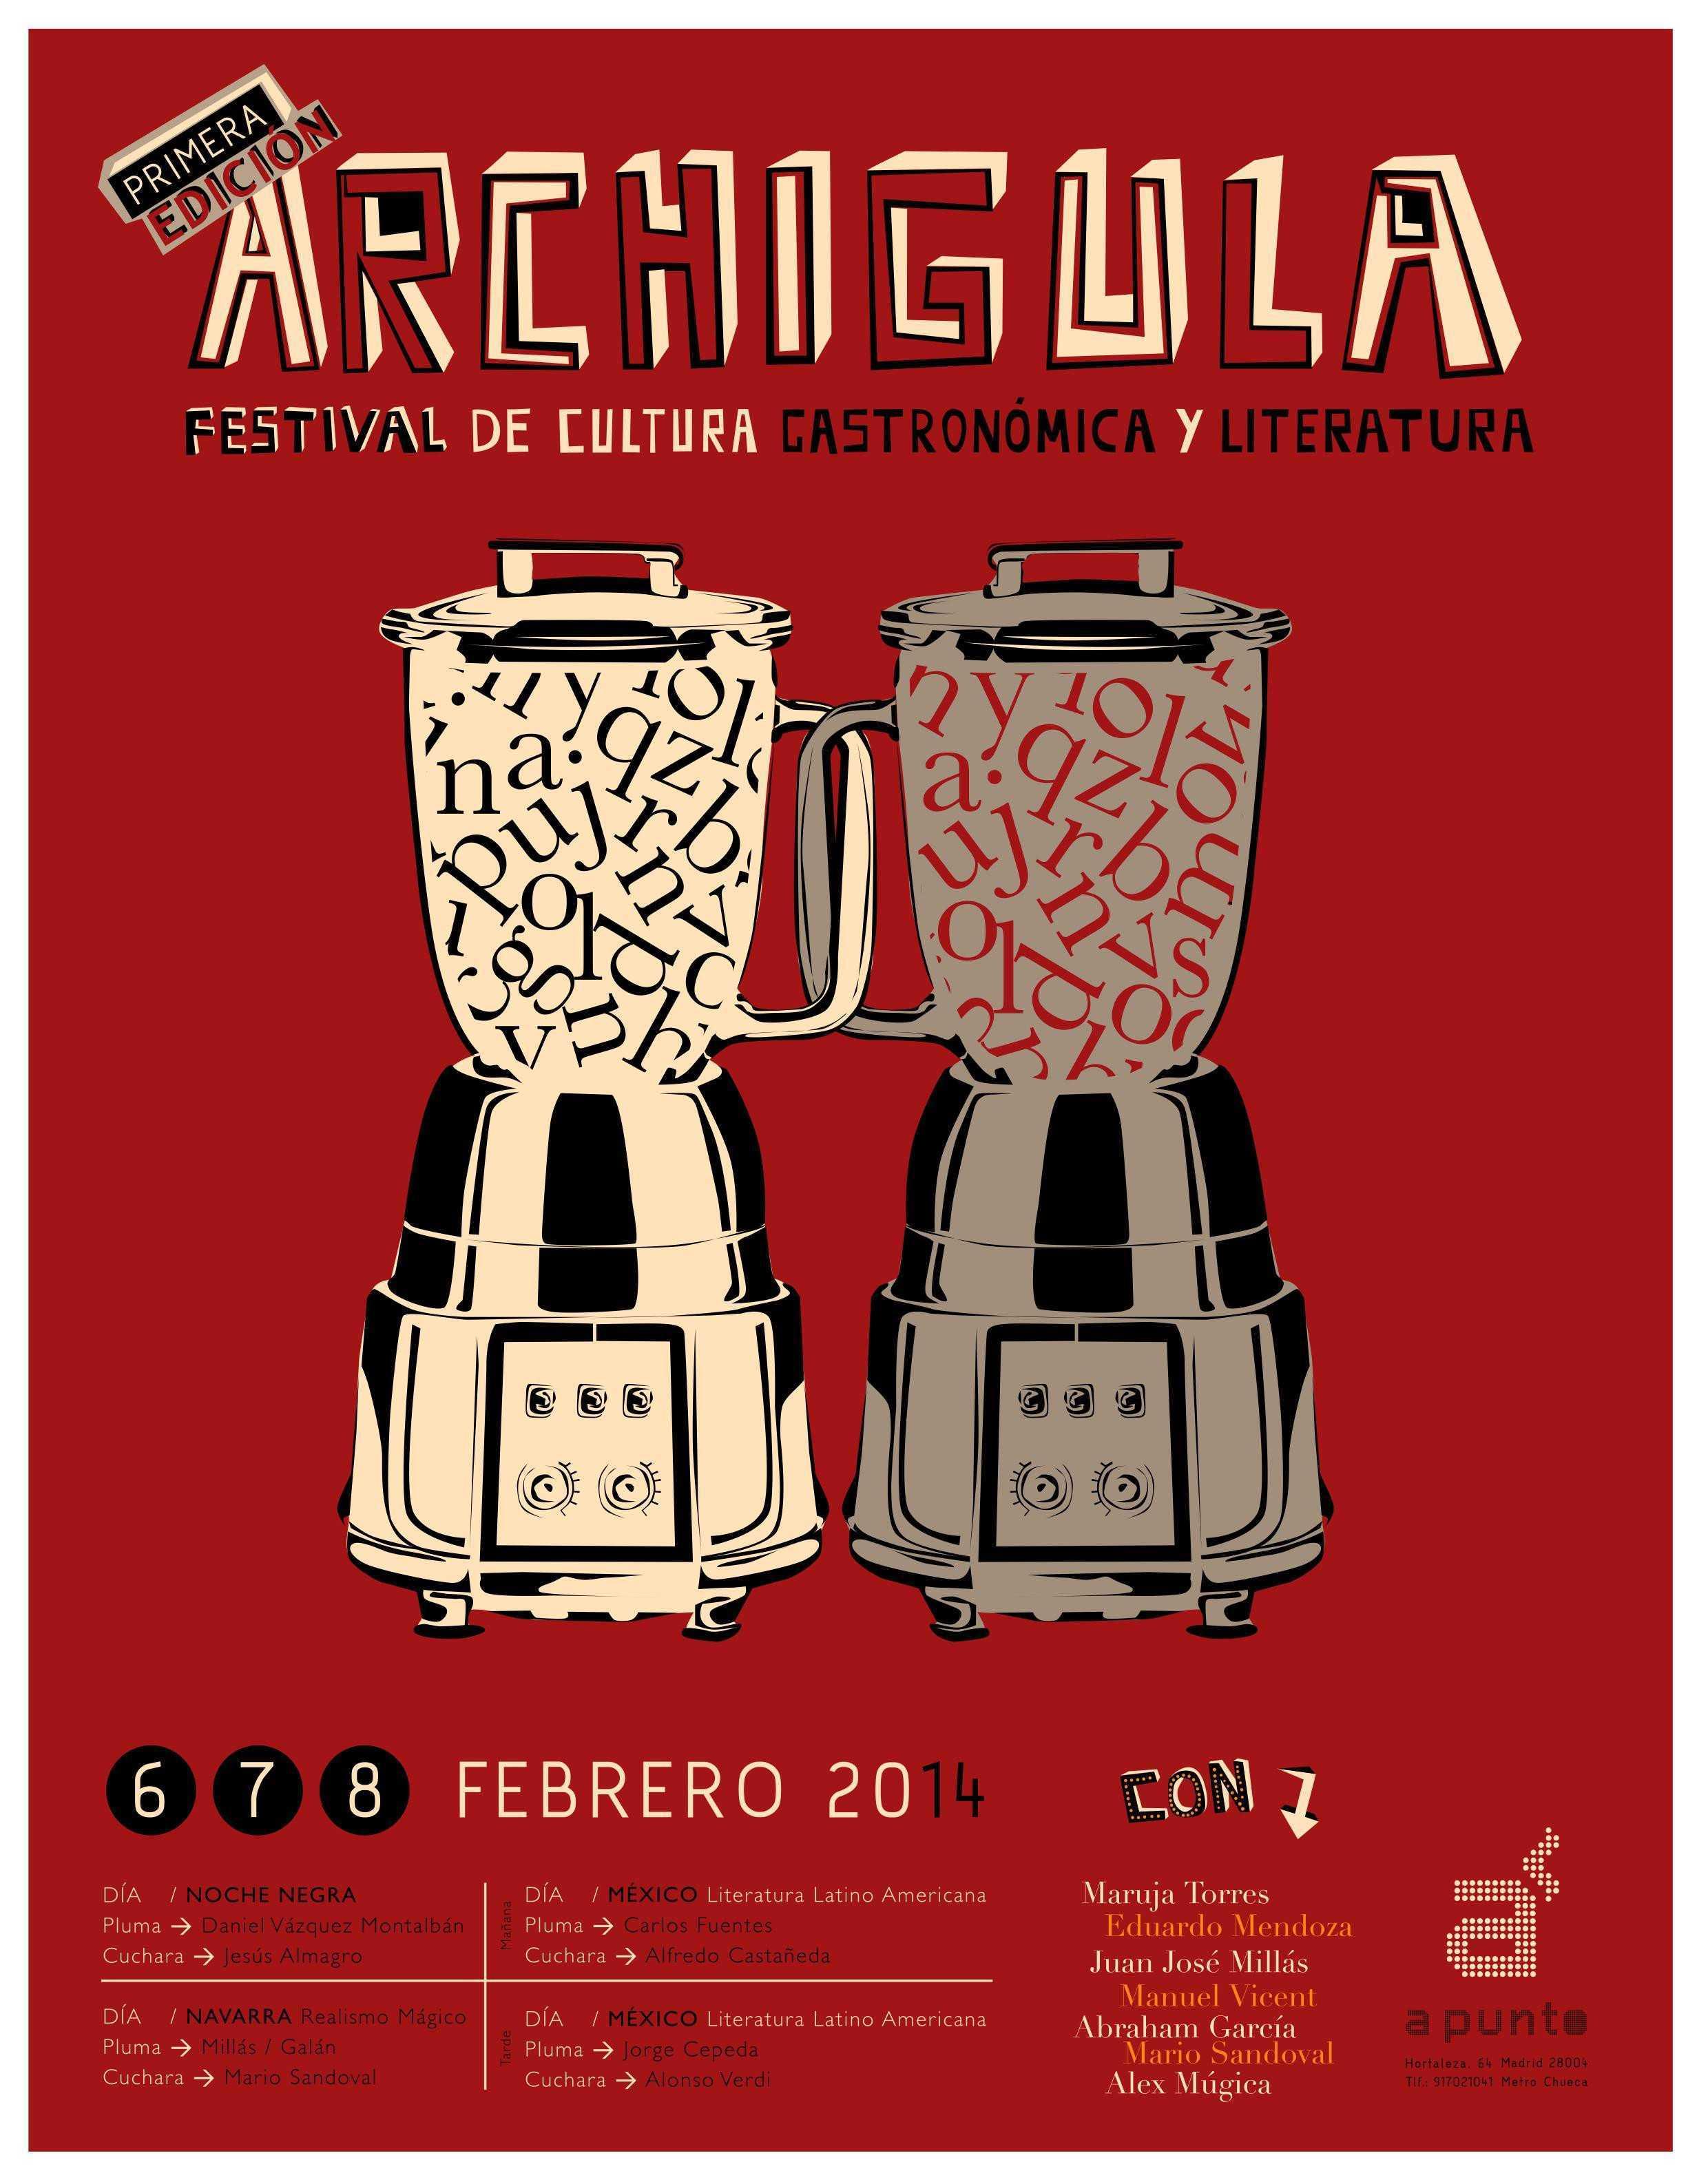 festival-archigula-literatura-y-gastronomia-07-02-15-tarde-1.jpg